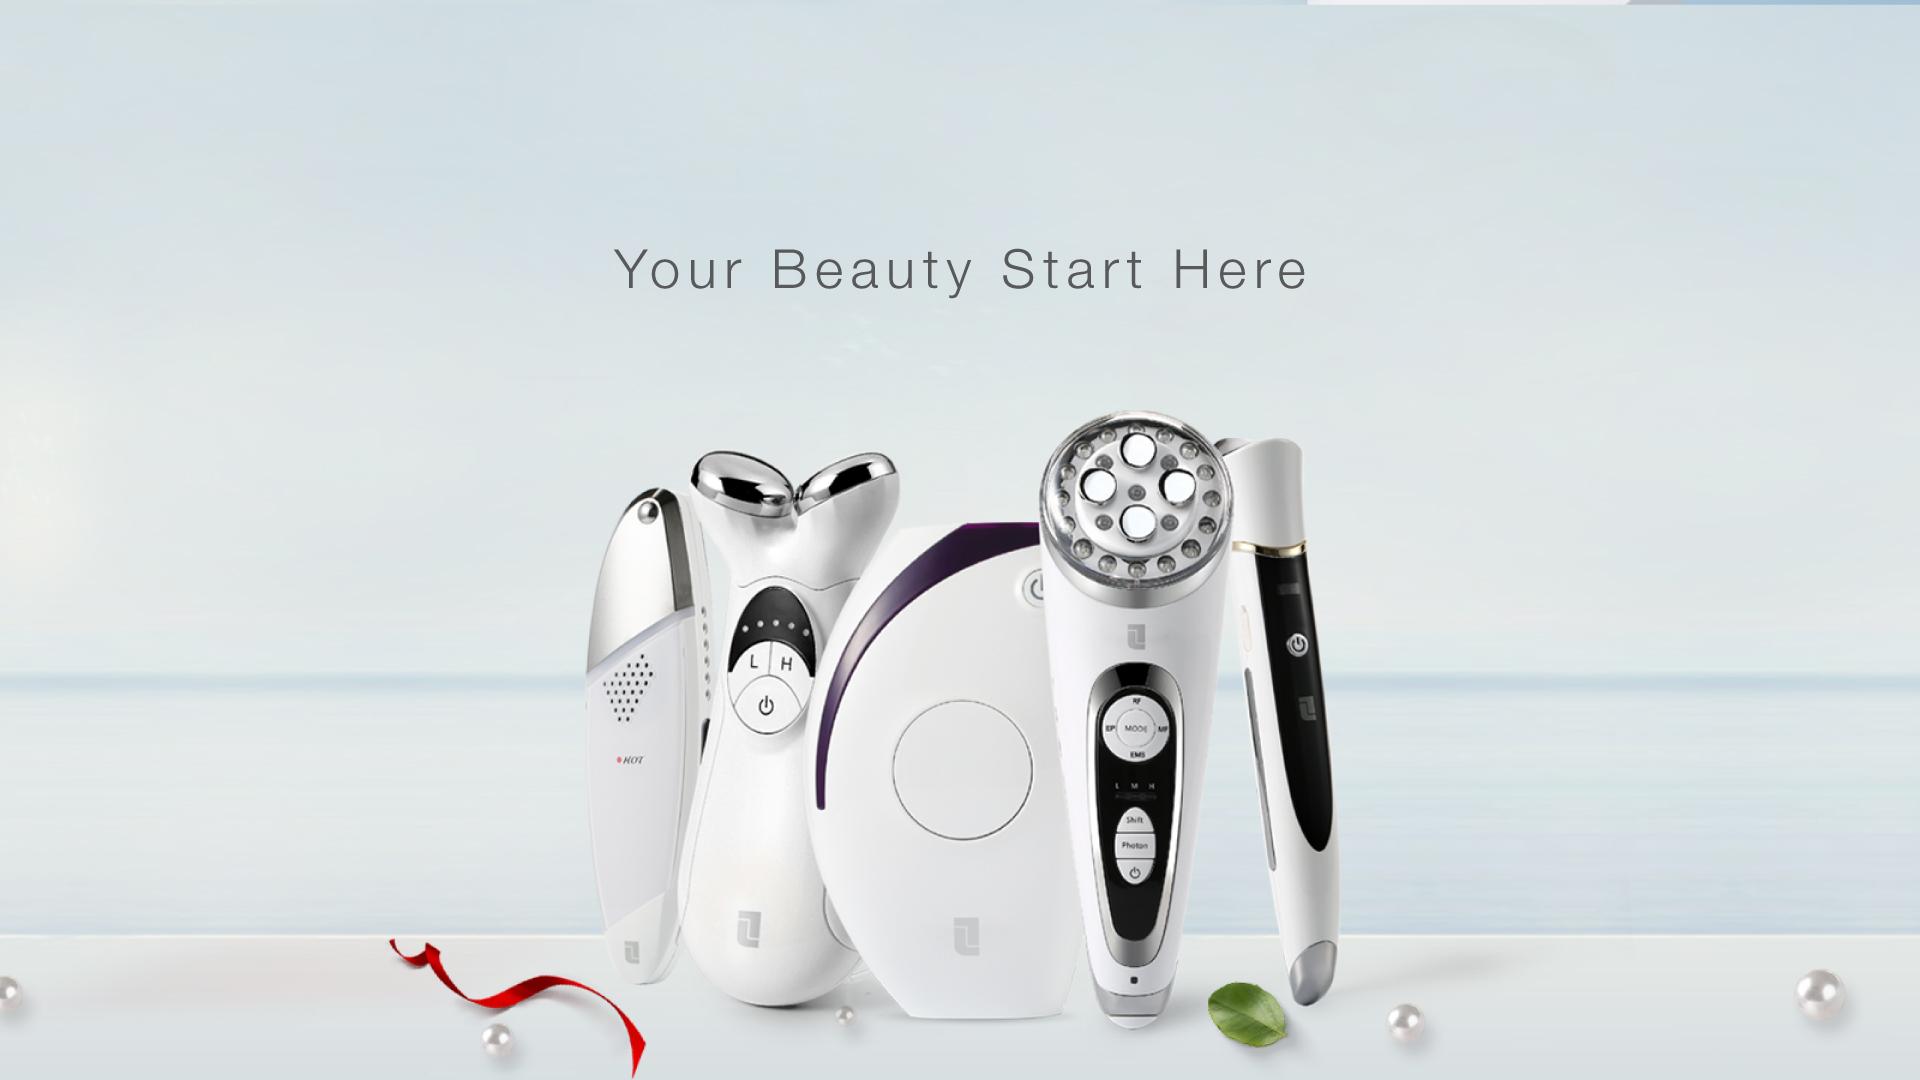 Lifetrons Singapore - Your Beauty Starts Here | Li-Tek Technology Groups Pte Ltd | Company Registeration No: 201503429M |